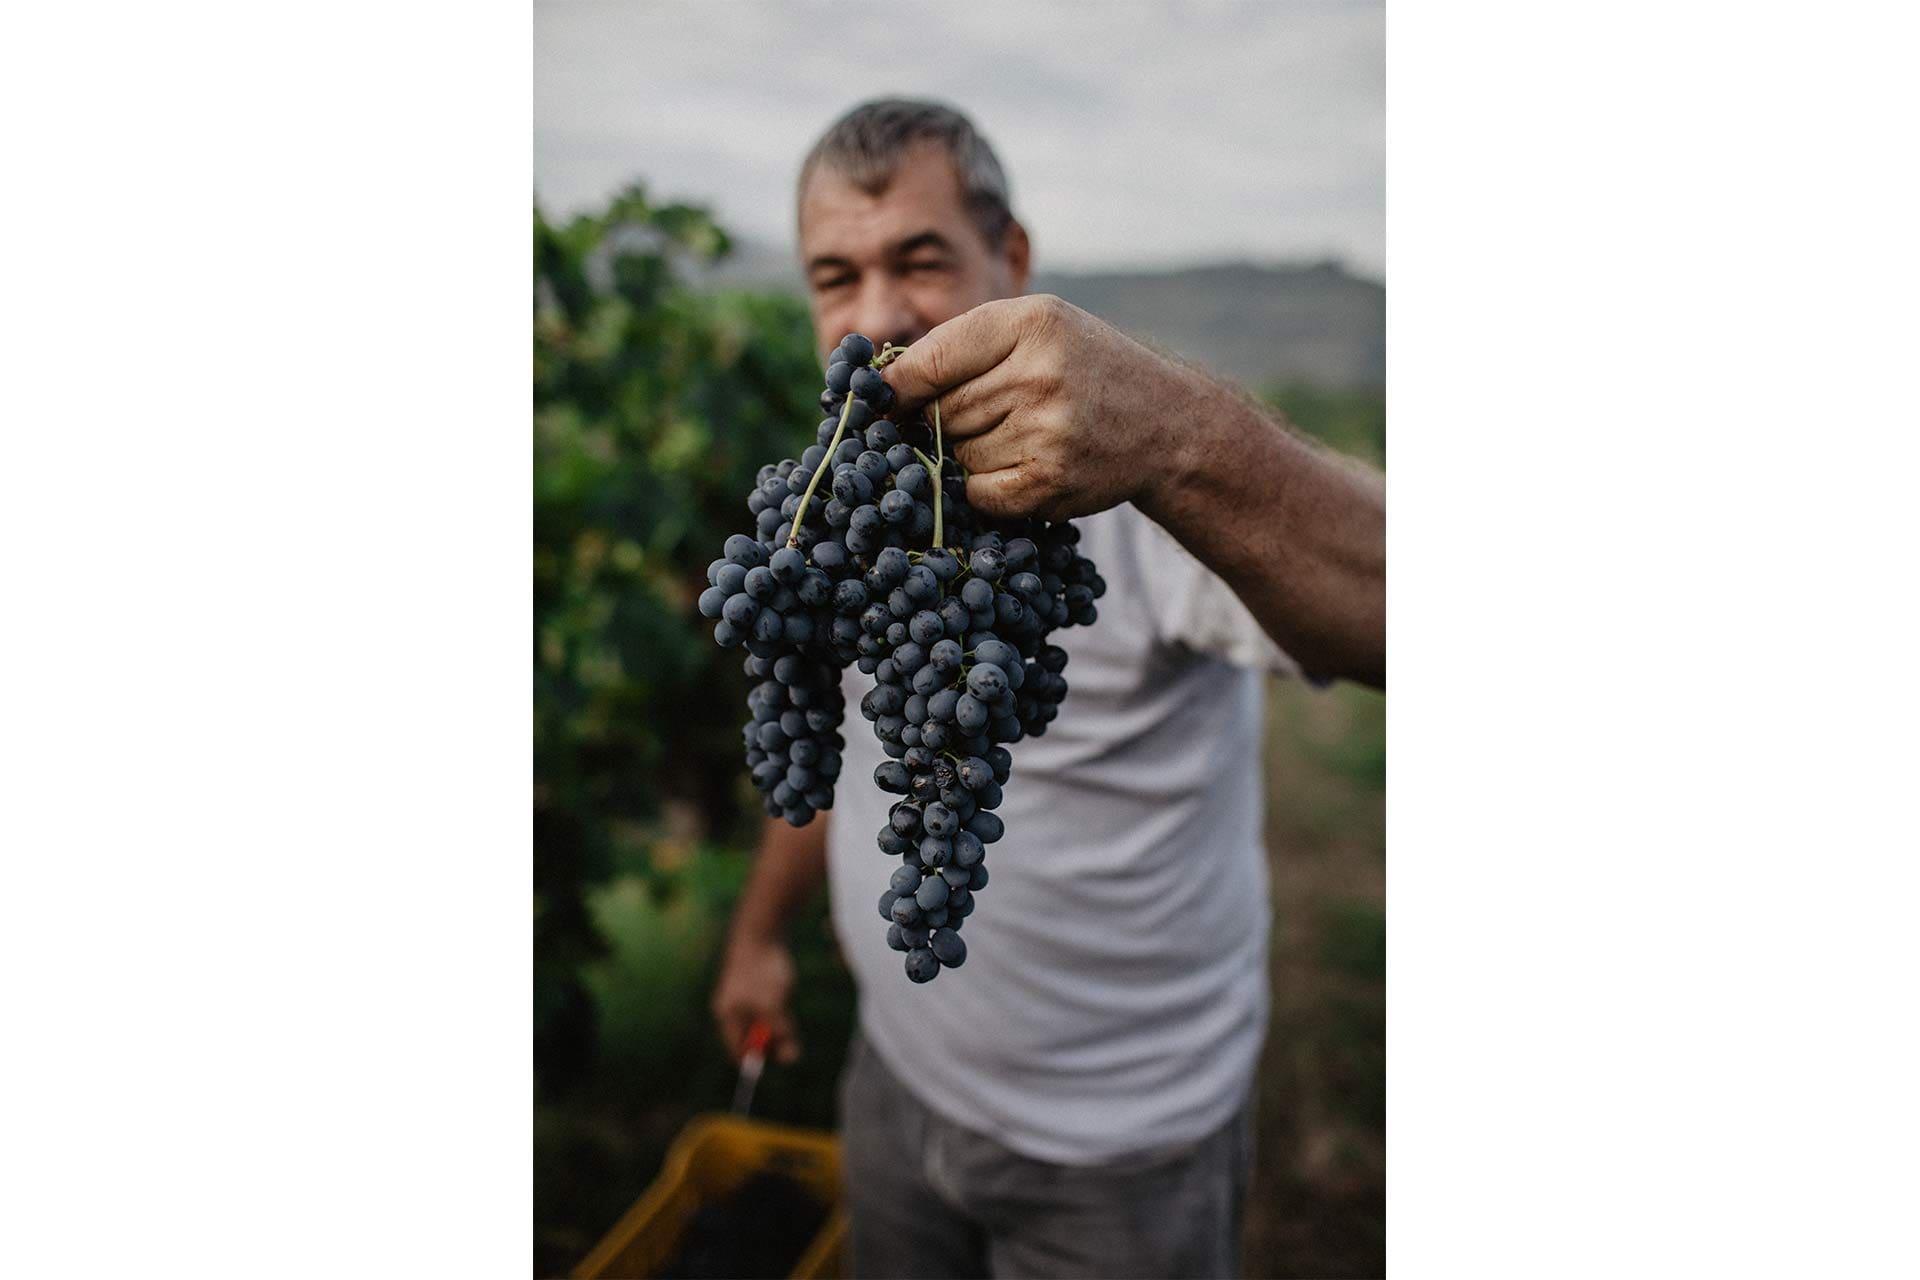 Man holding a grape